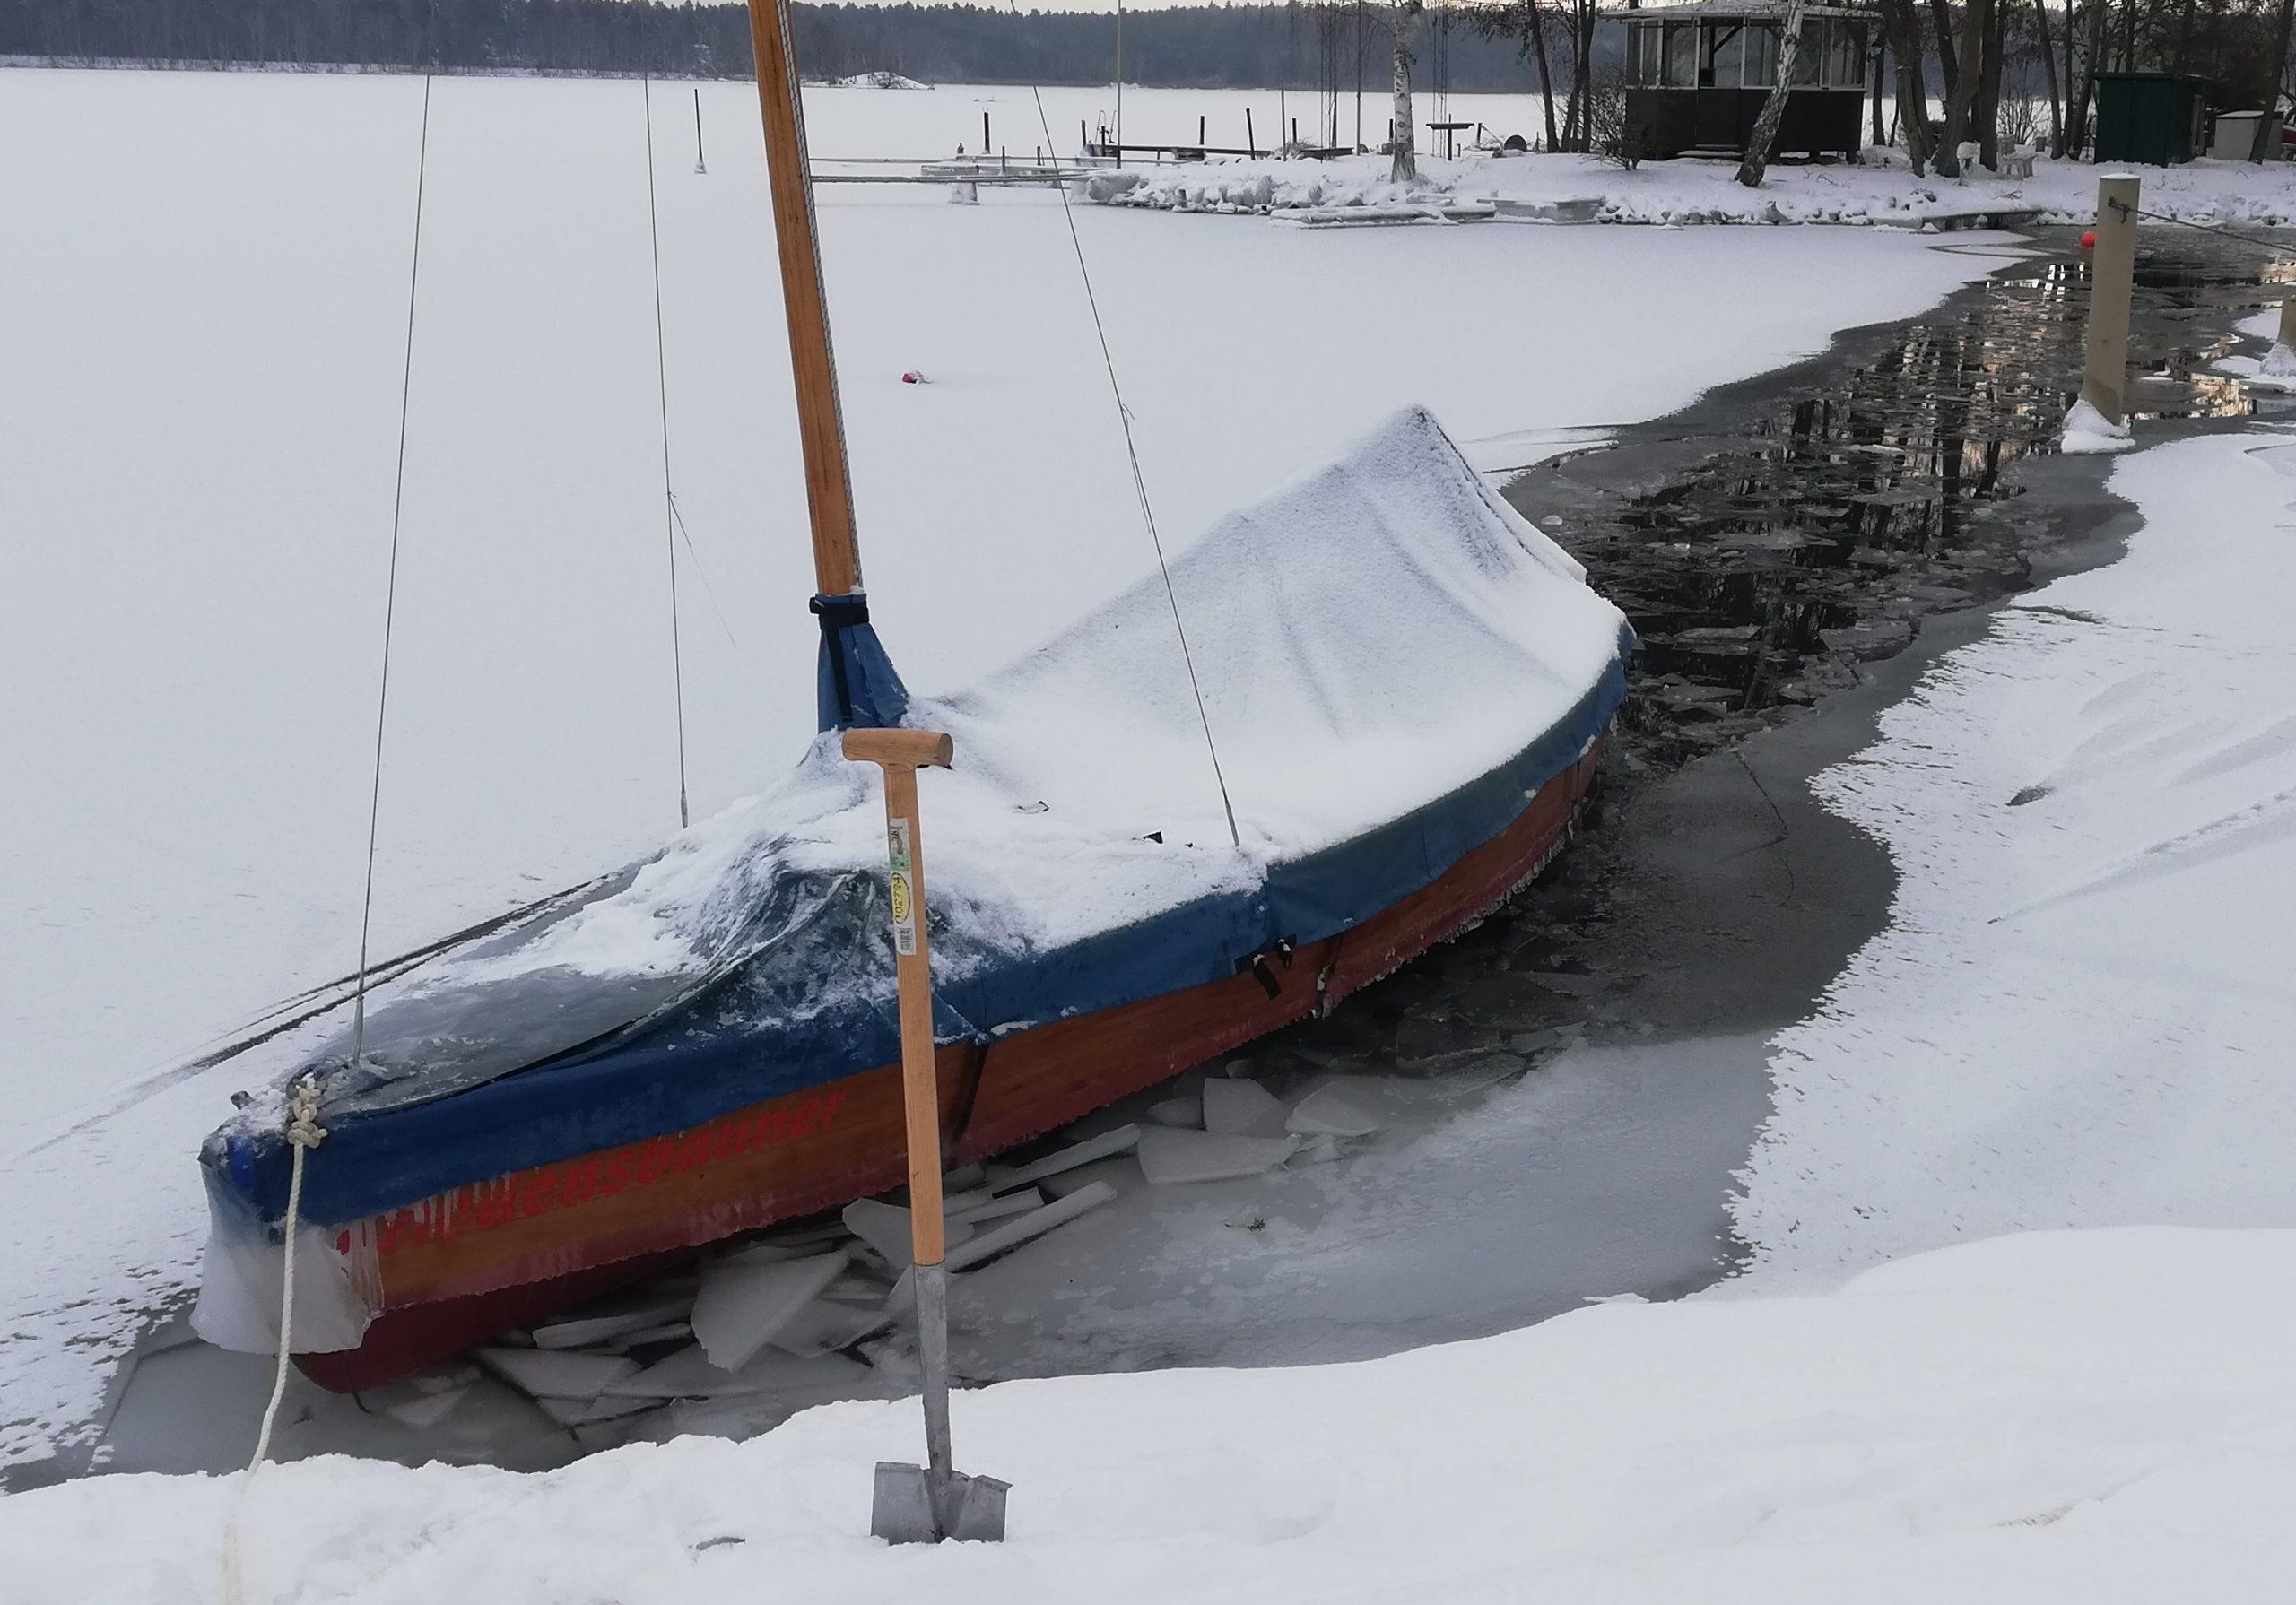 Holzpirat Eisbrecher Micha thread  Eis scaled